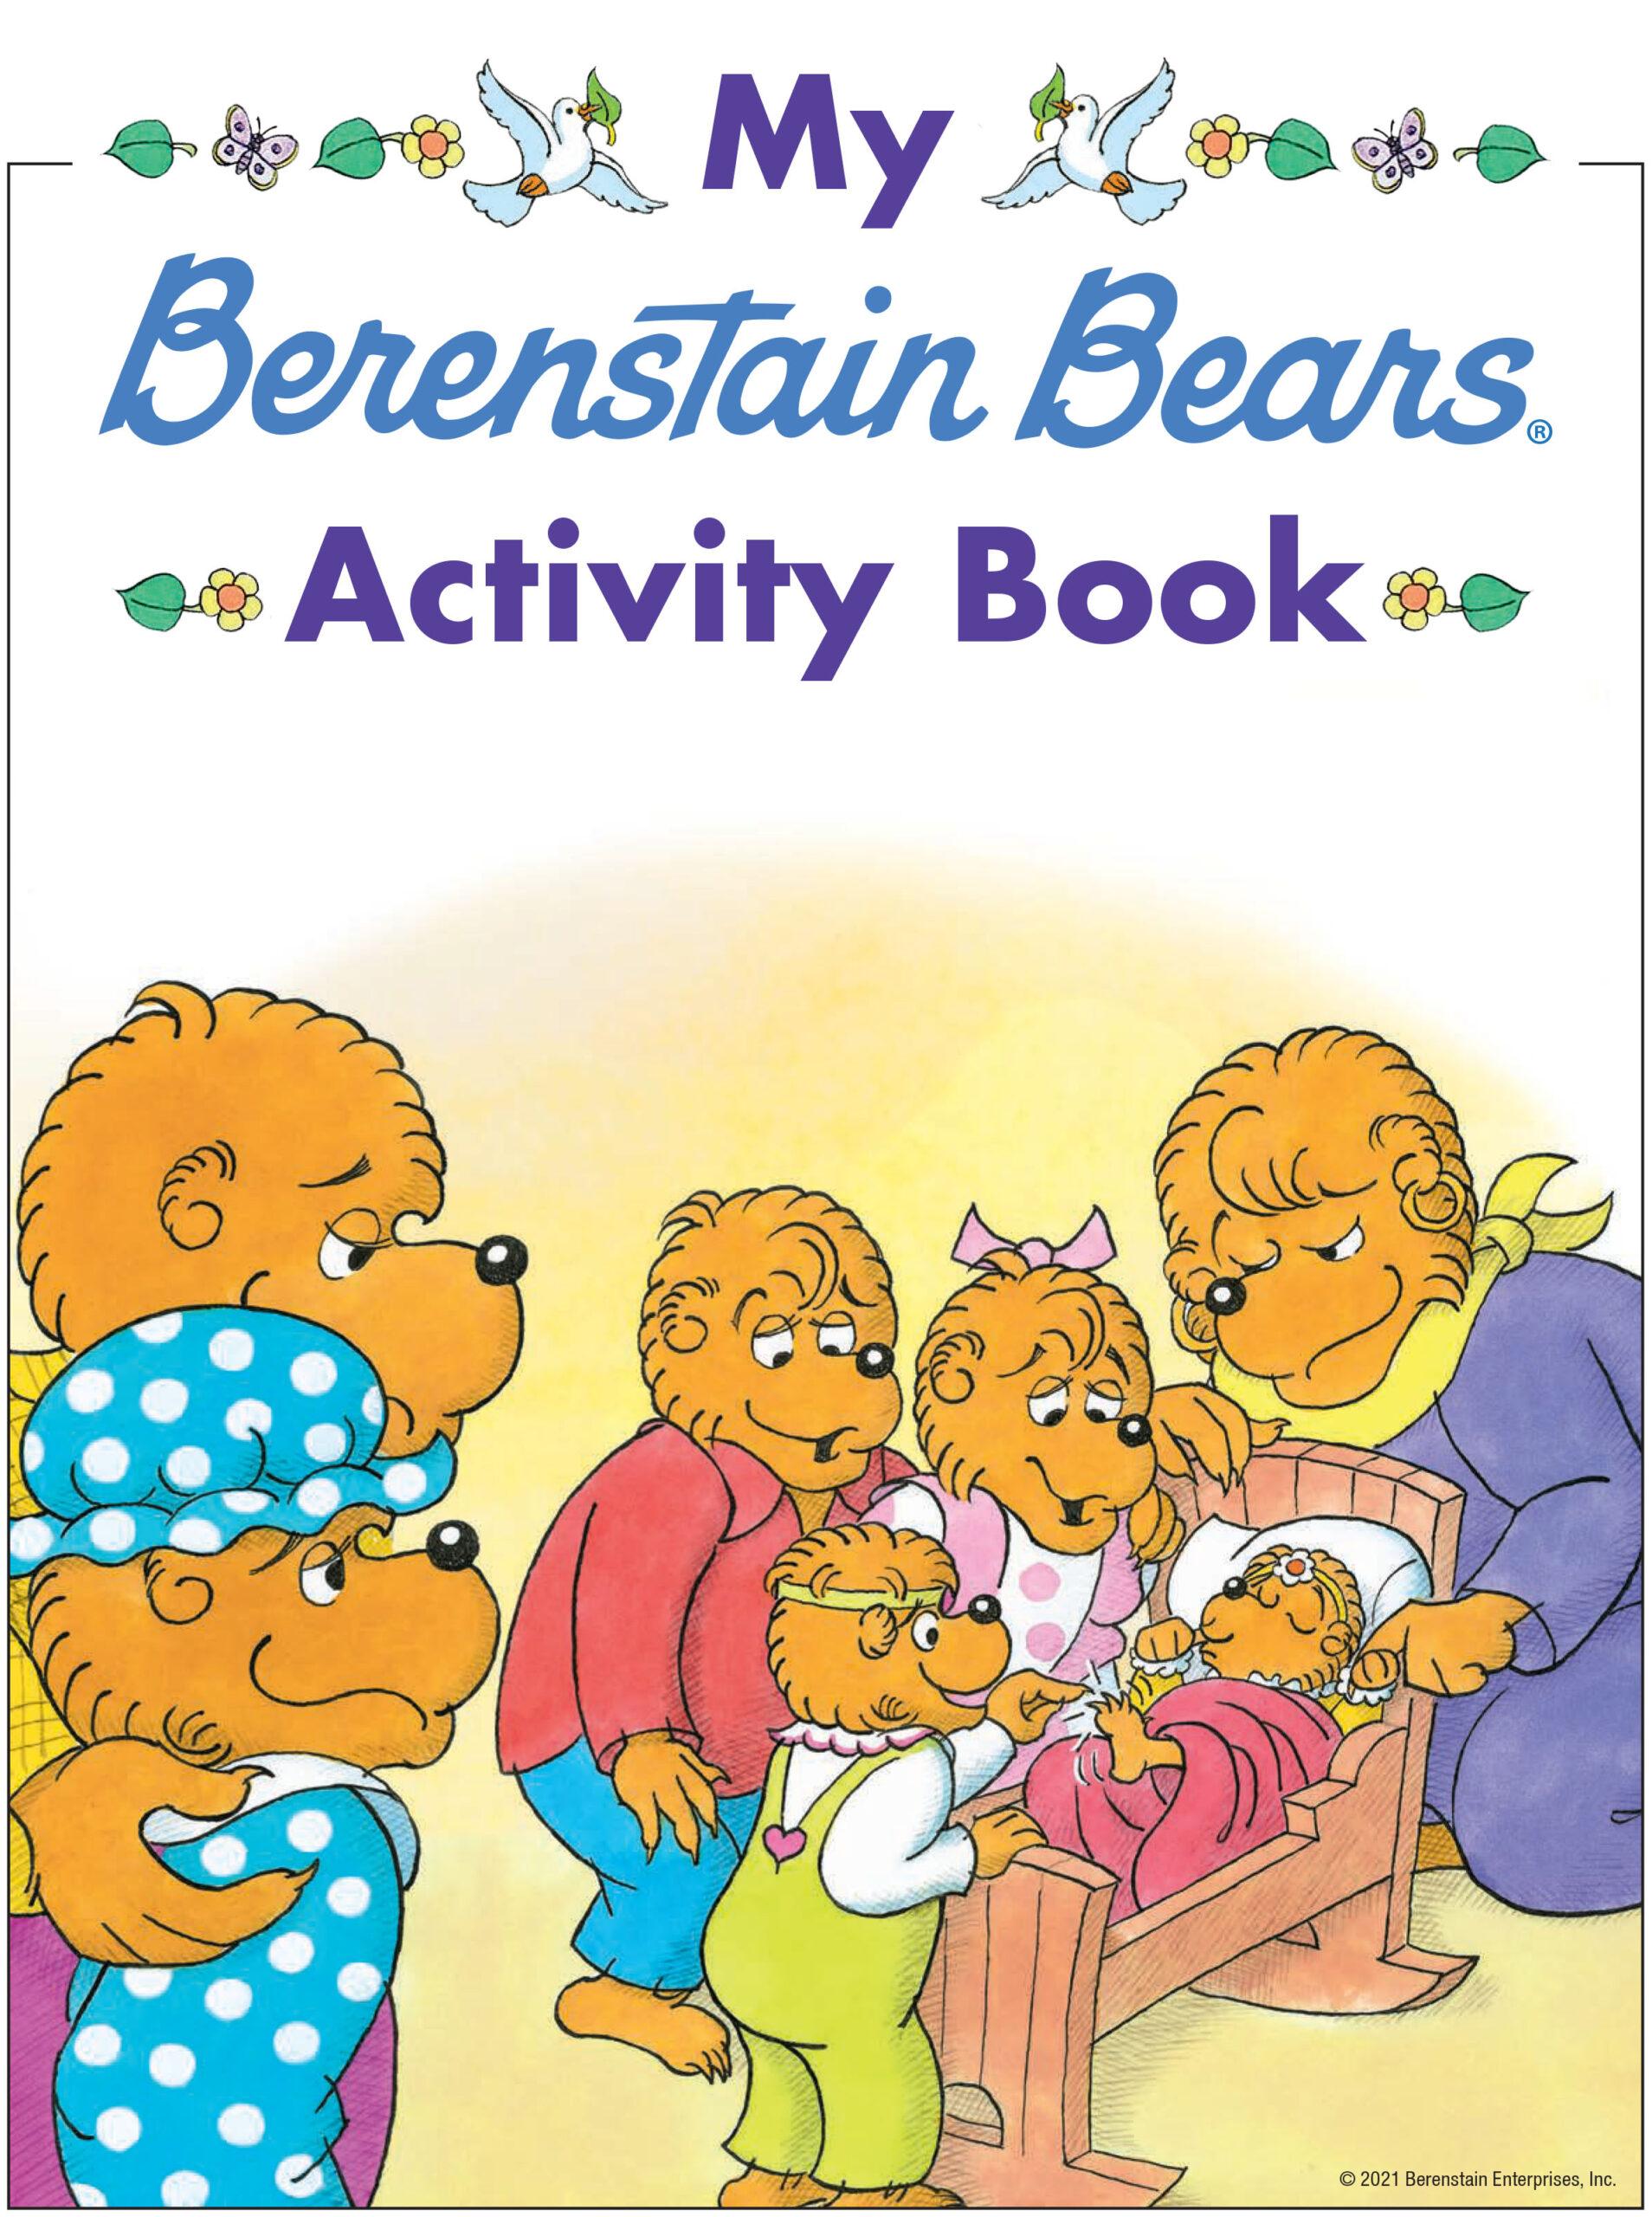 Berenstain Bears Activity Book